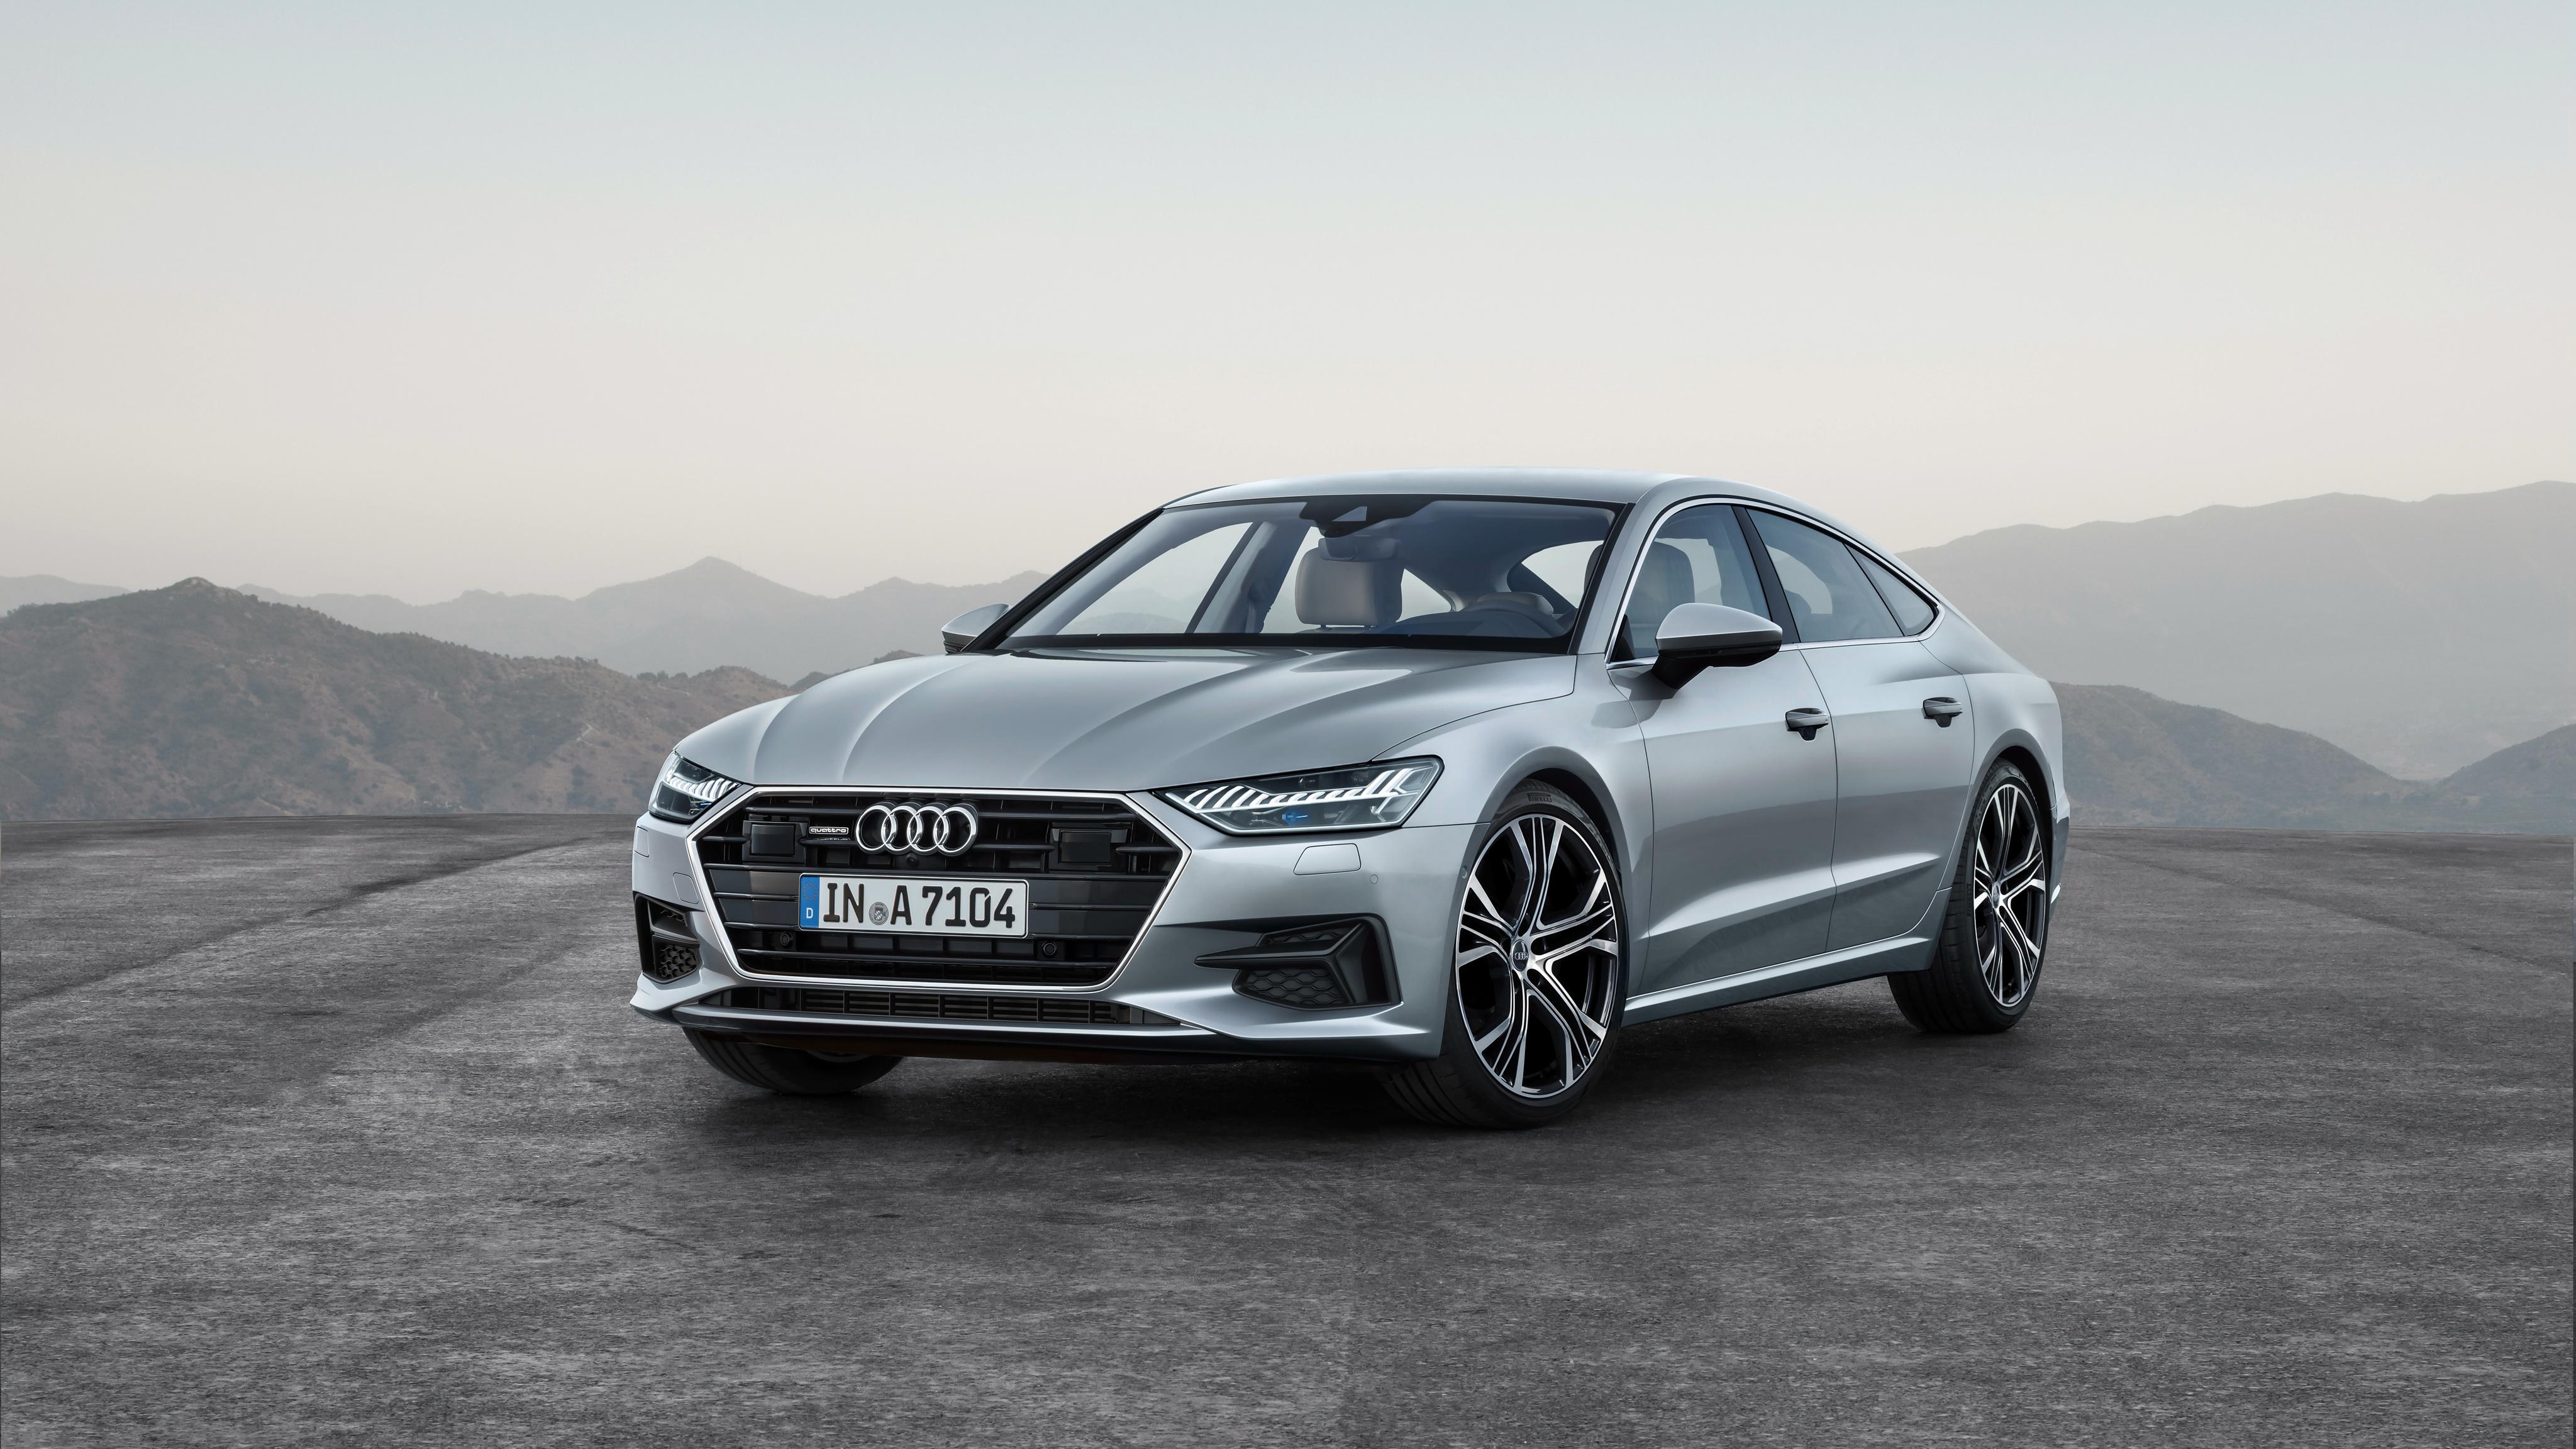 2018 Audi A7 Sportback Quattro 4k Wallpaper Hd Car Wallpapers Id